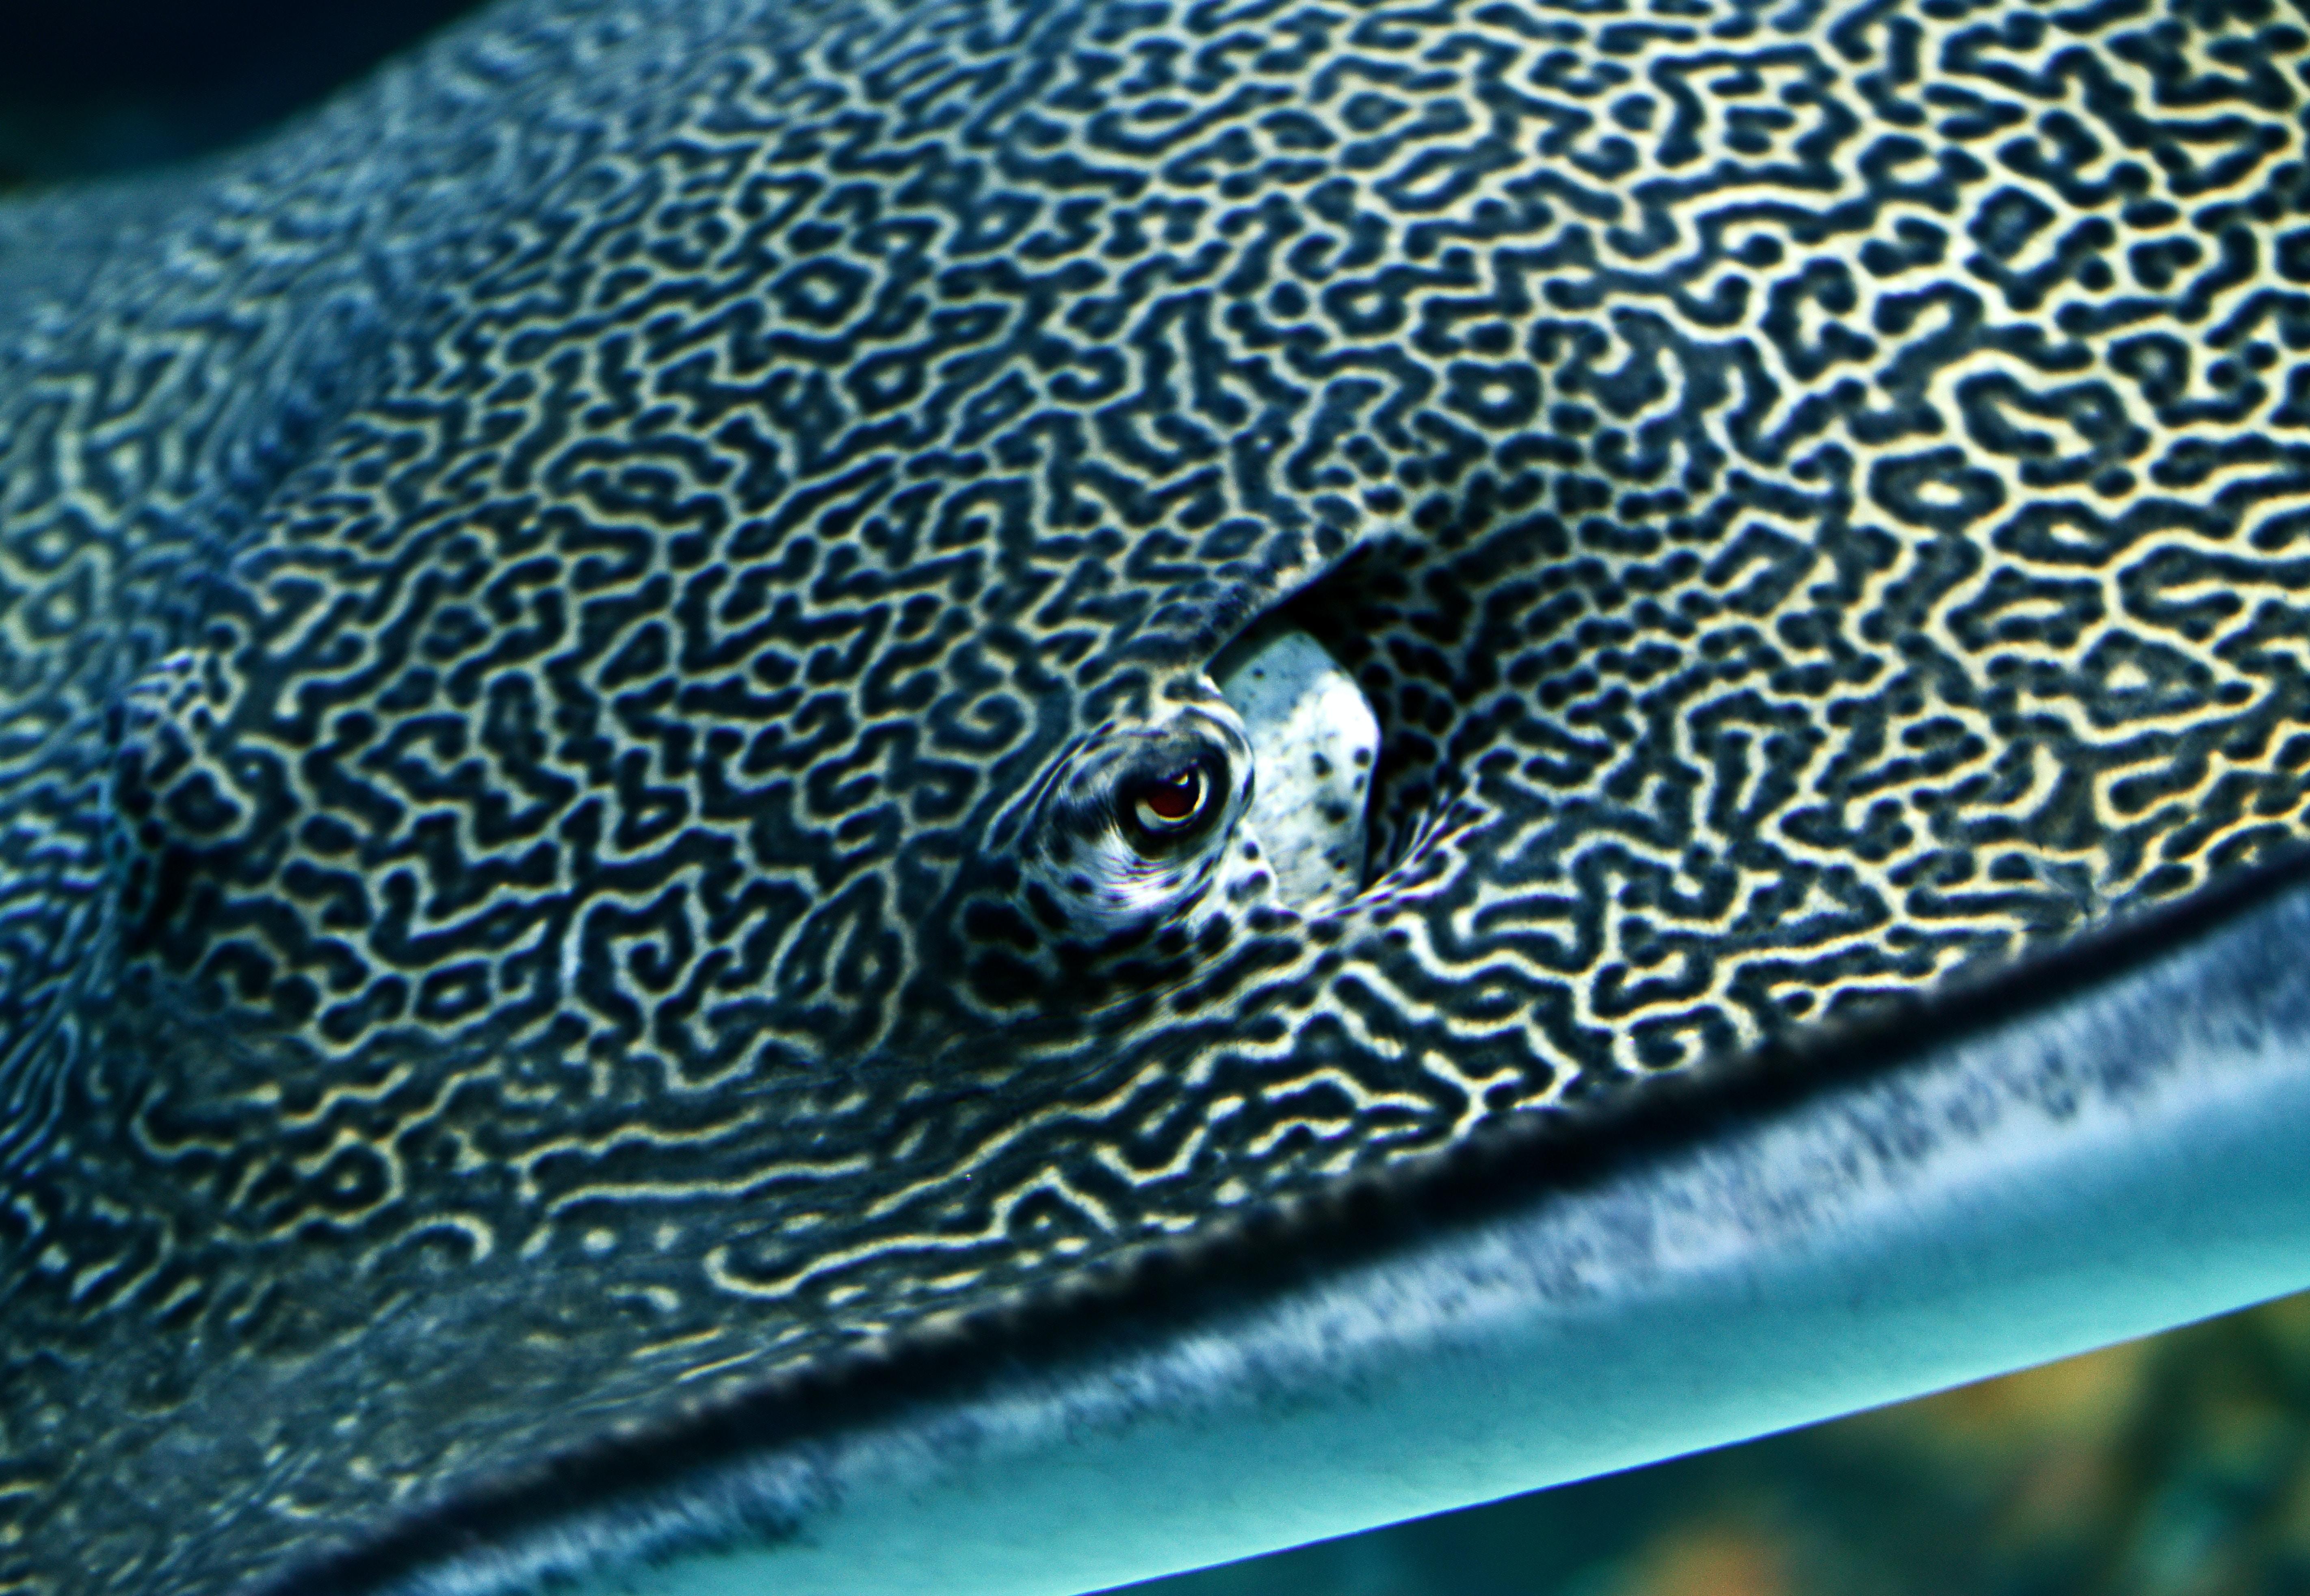 black and gray stingray closeup photography